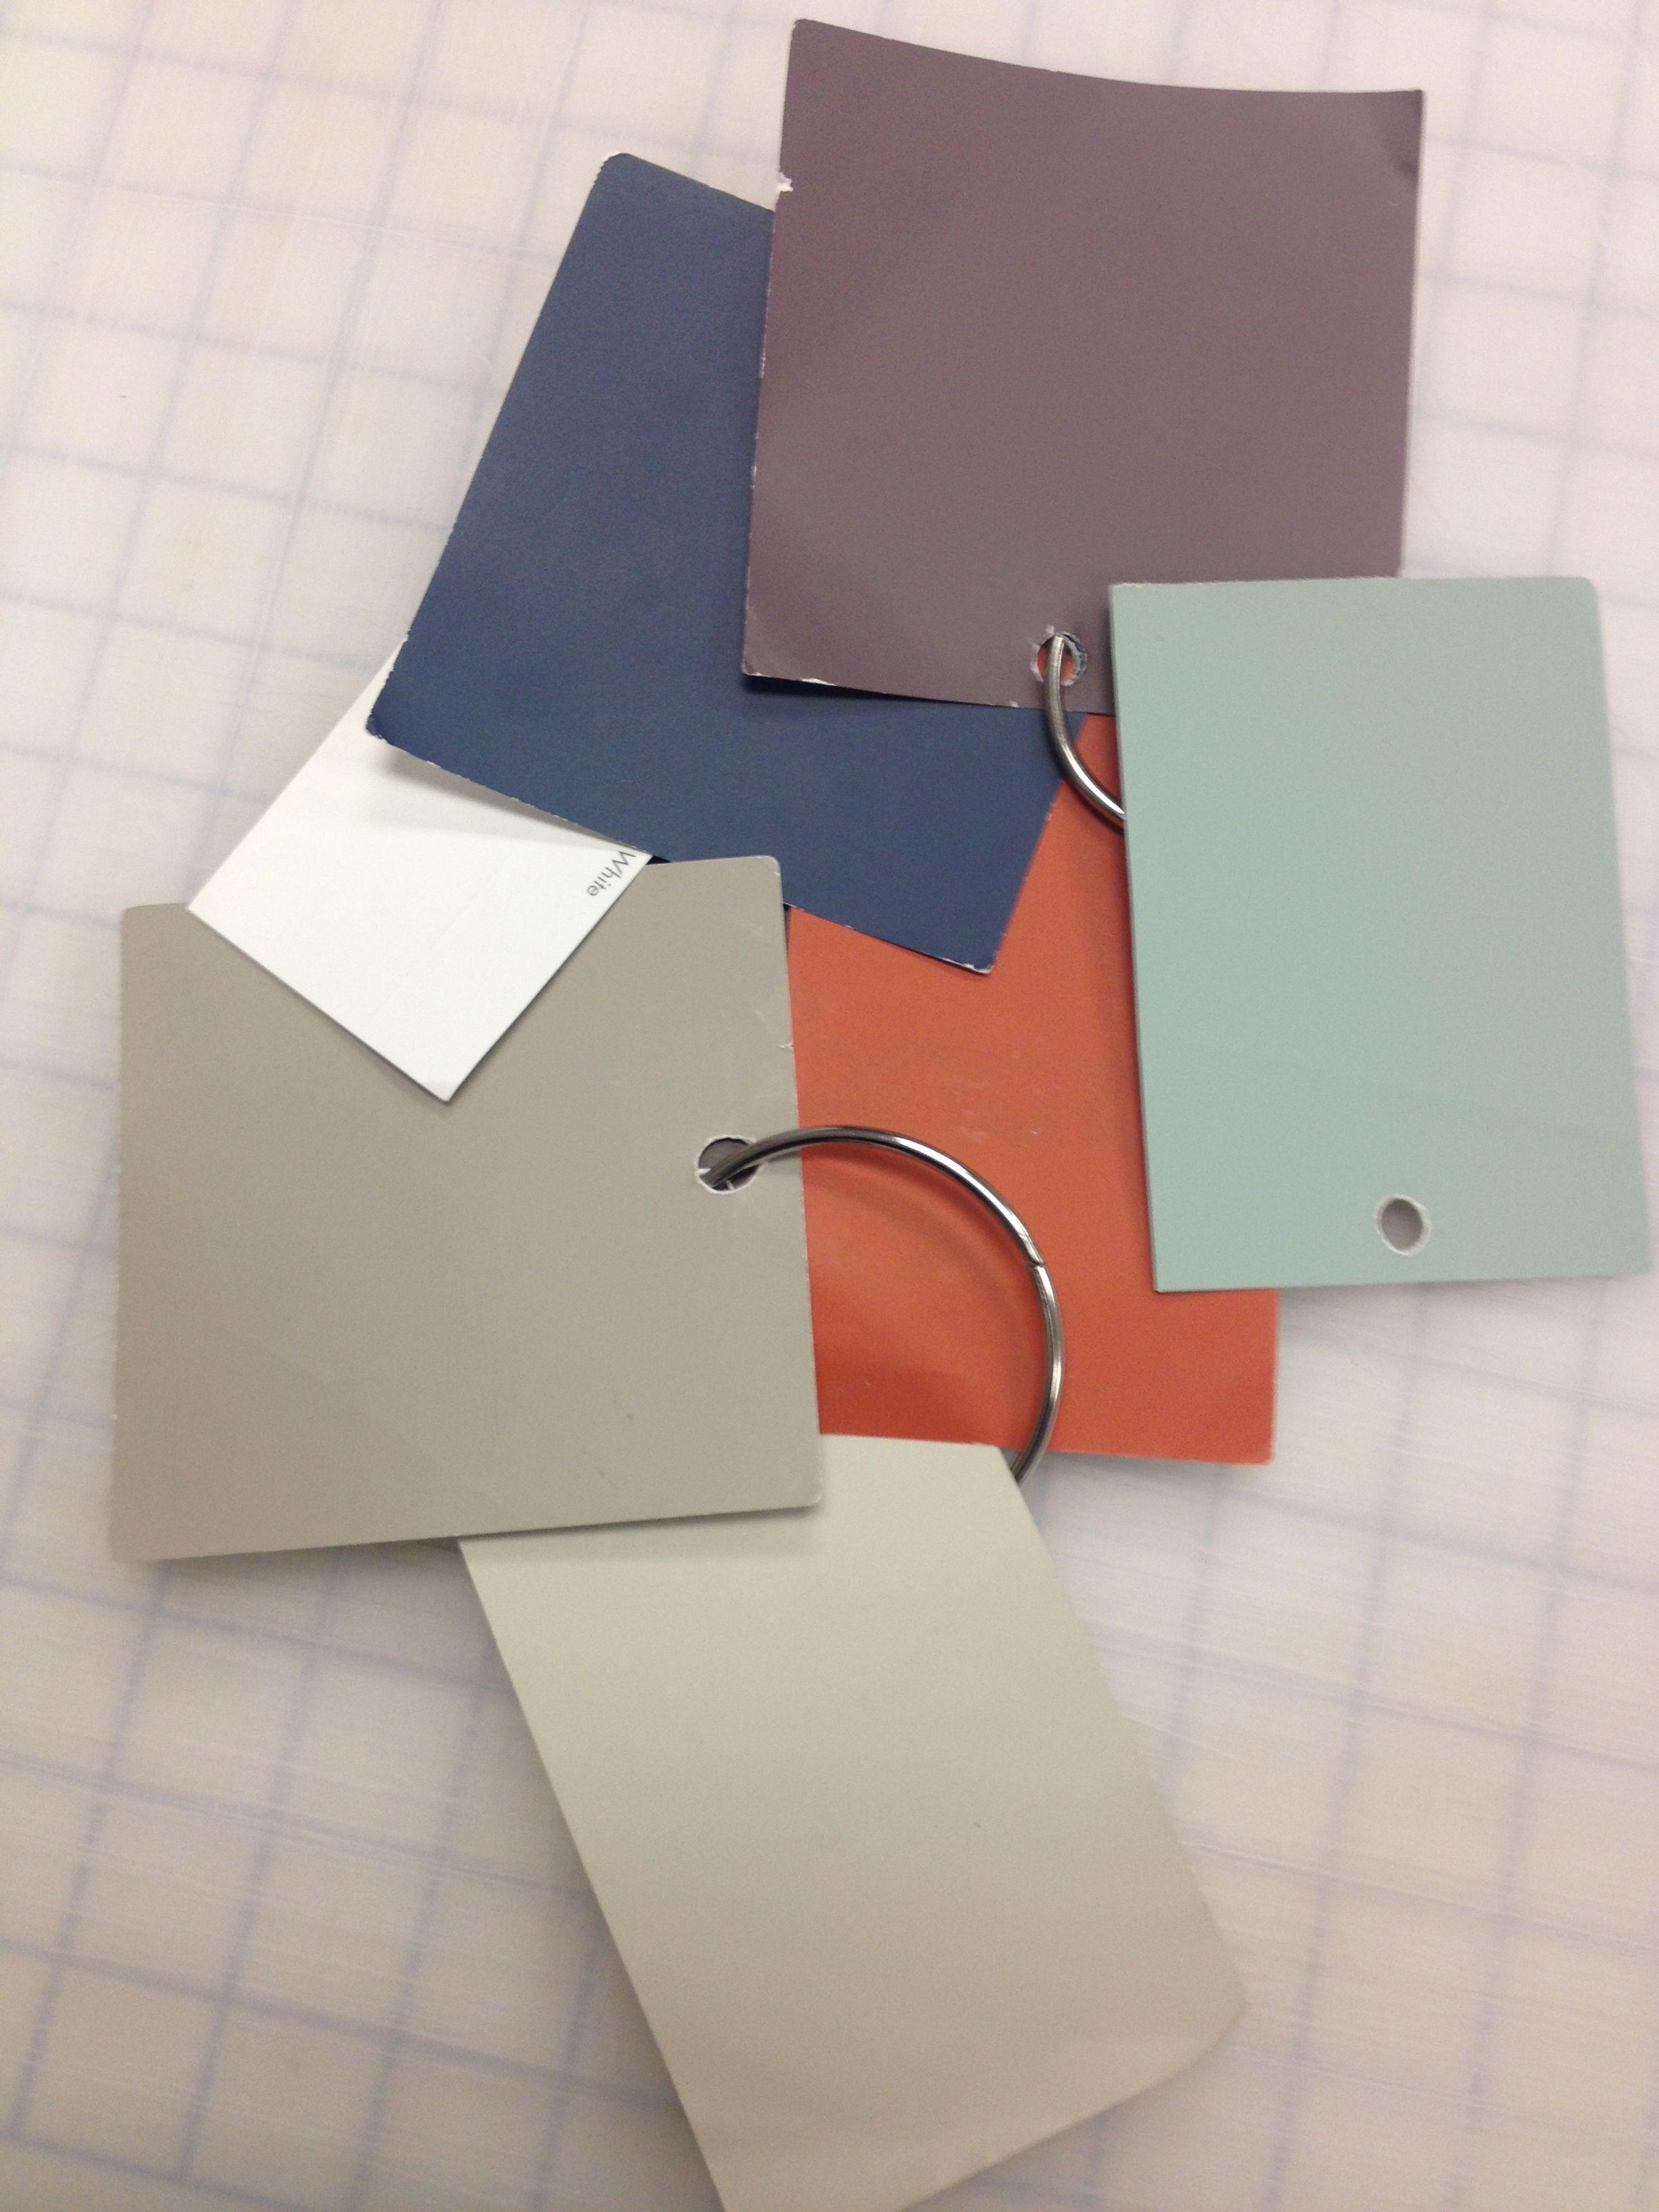 My house wednesday inspiration benjamin moore quot gentleman s gray - Proposed Color Palette Dusty Aqua Porter Paint Amazon Soil Ben Moore